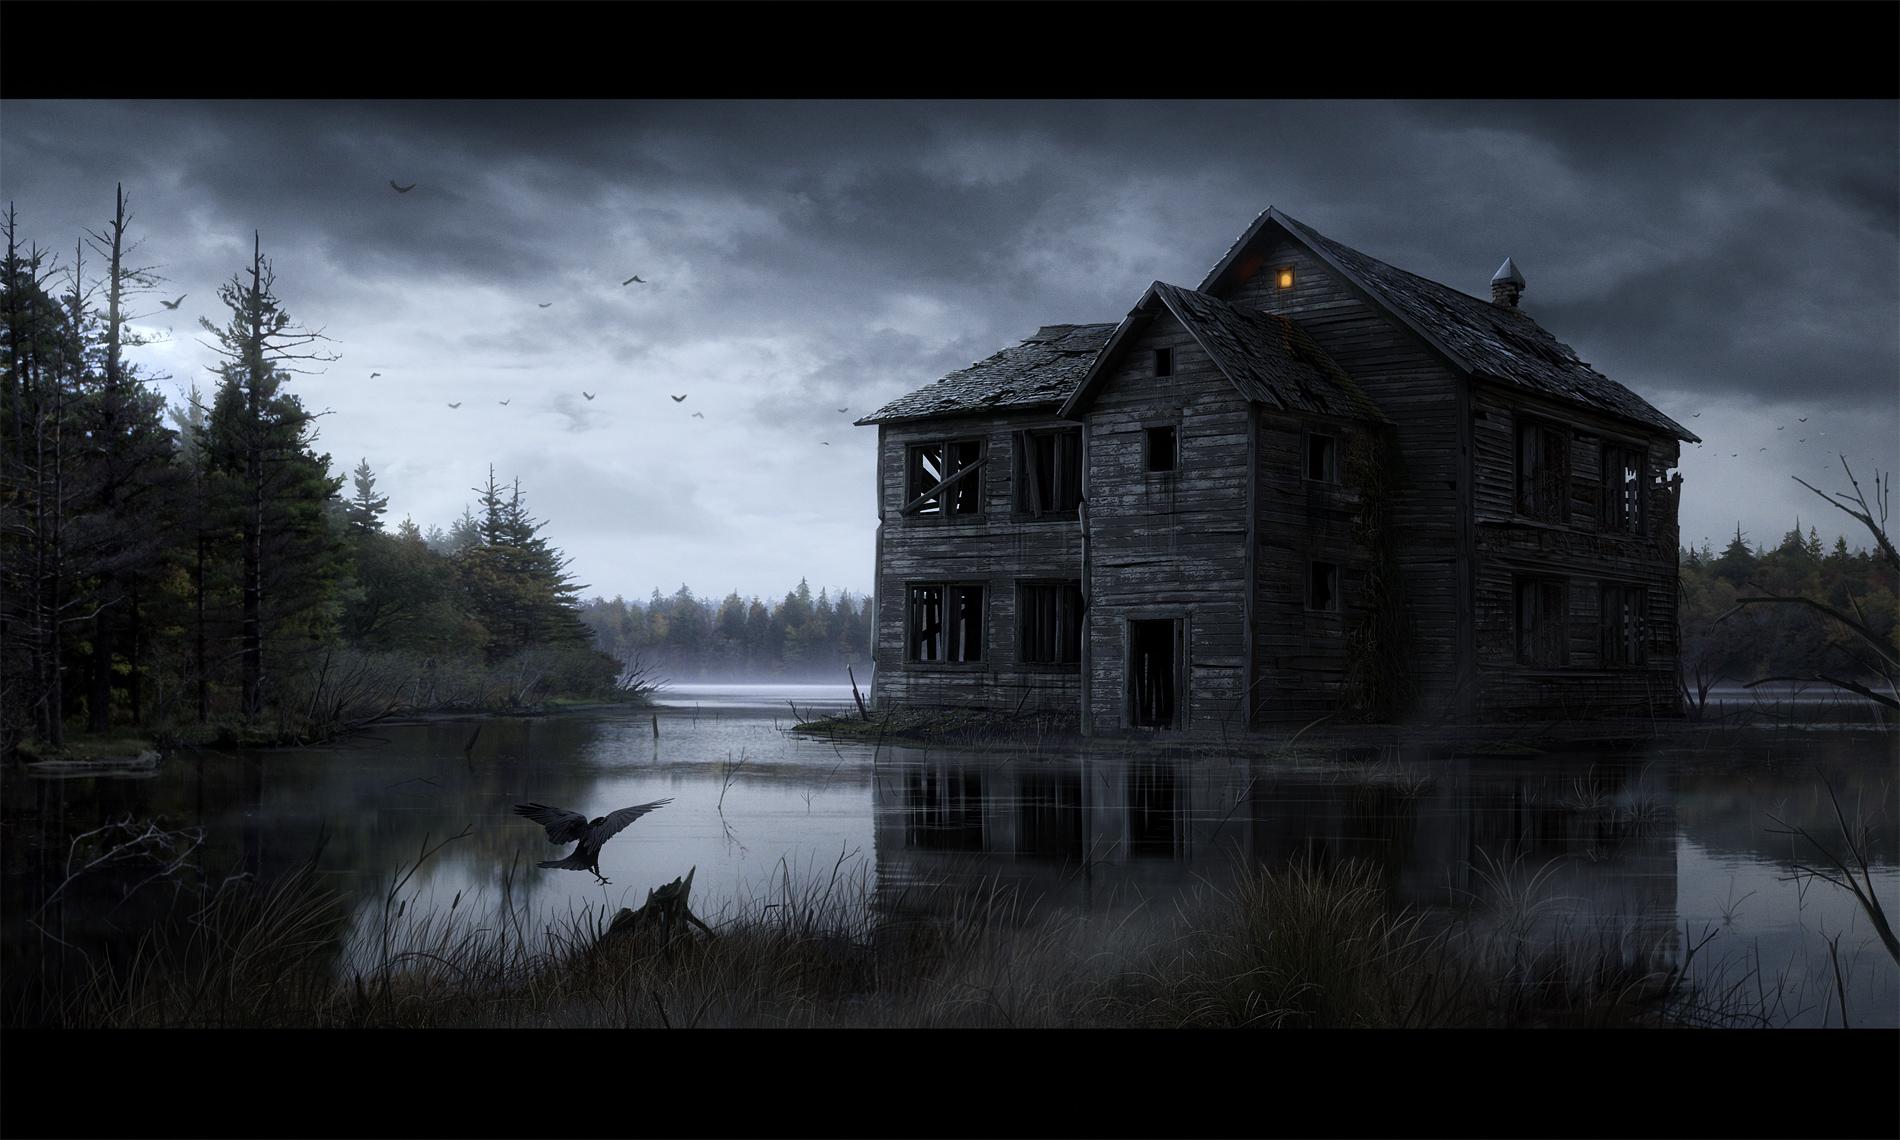 Haunted Horror Creepy Spooky Scary Halloween Haunted House Wallpaper 1900x1140